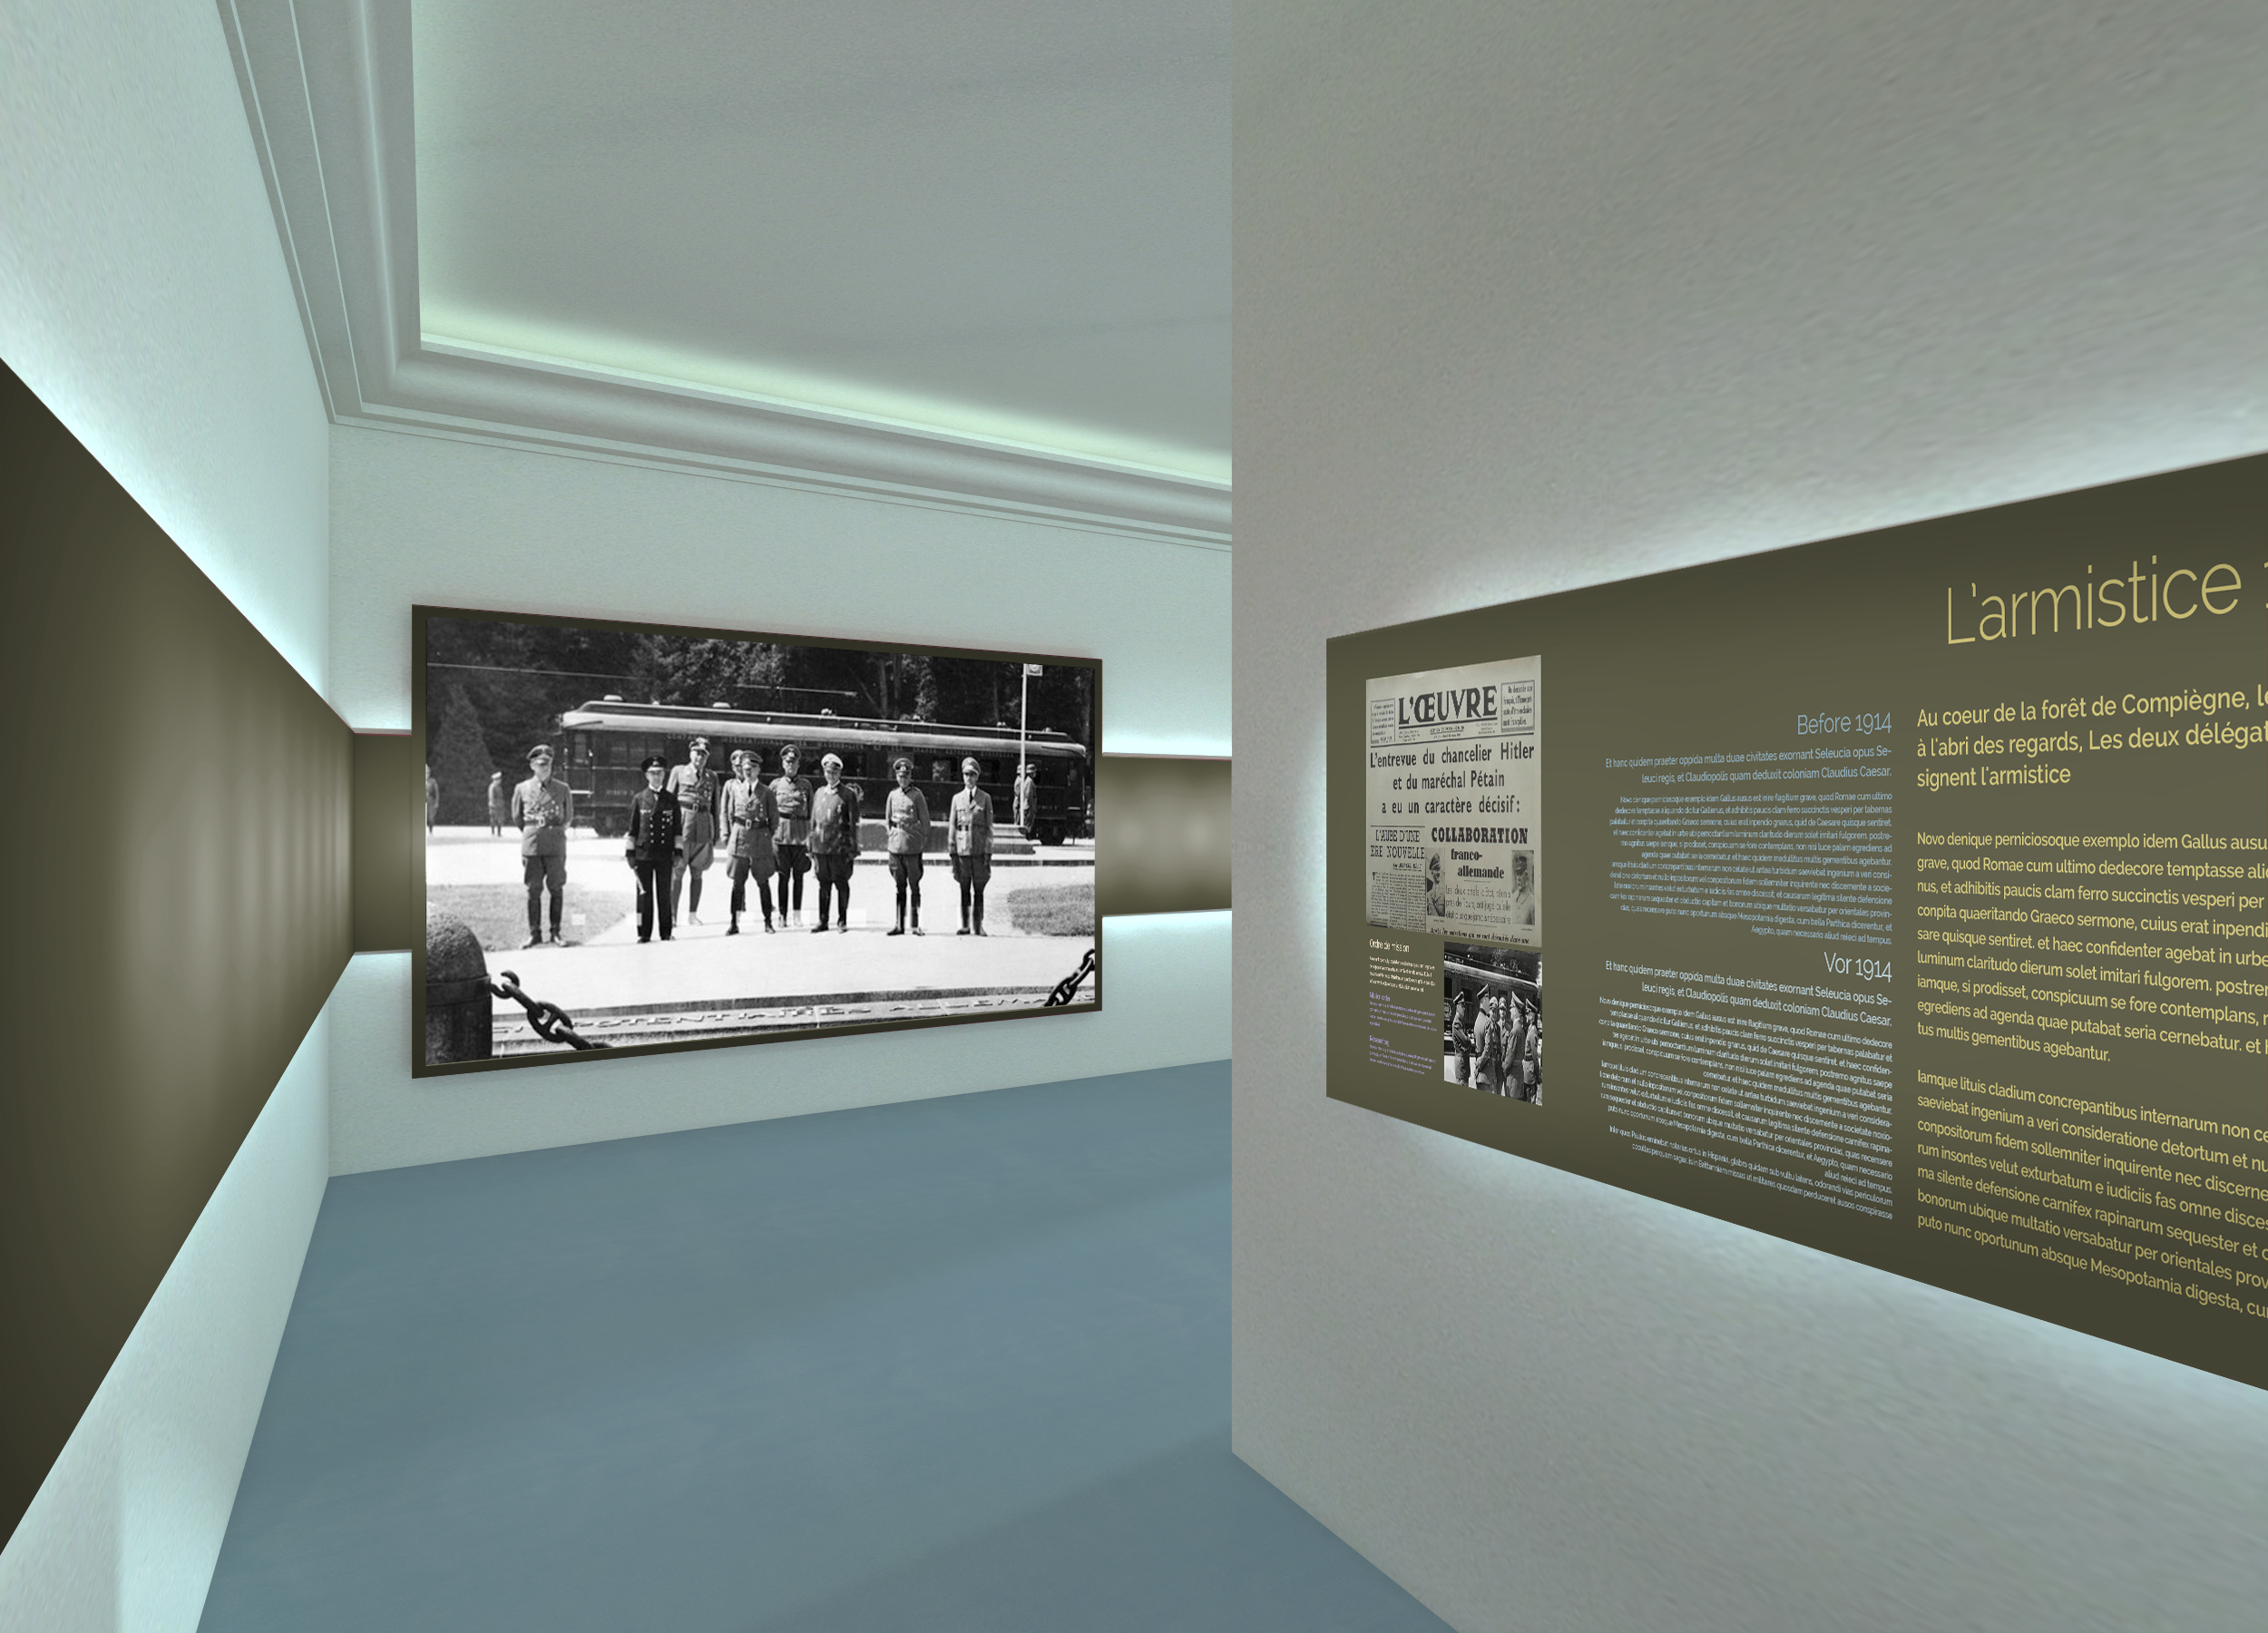 la-salle-armistice-1940-scénographie